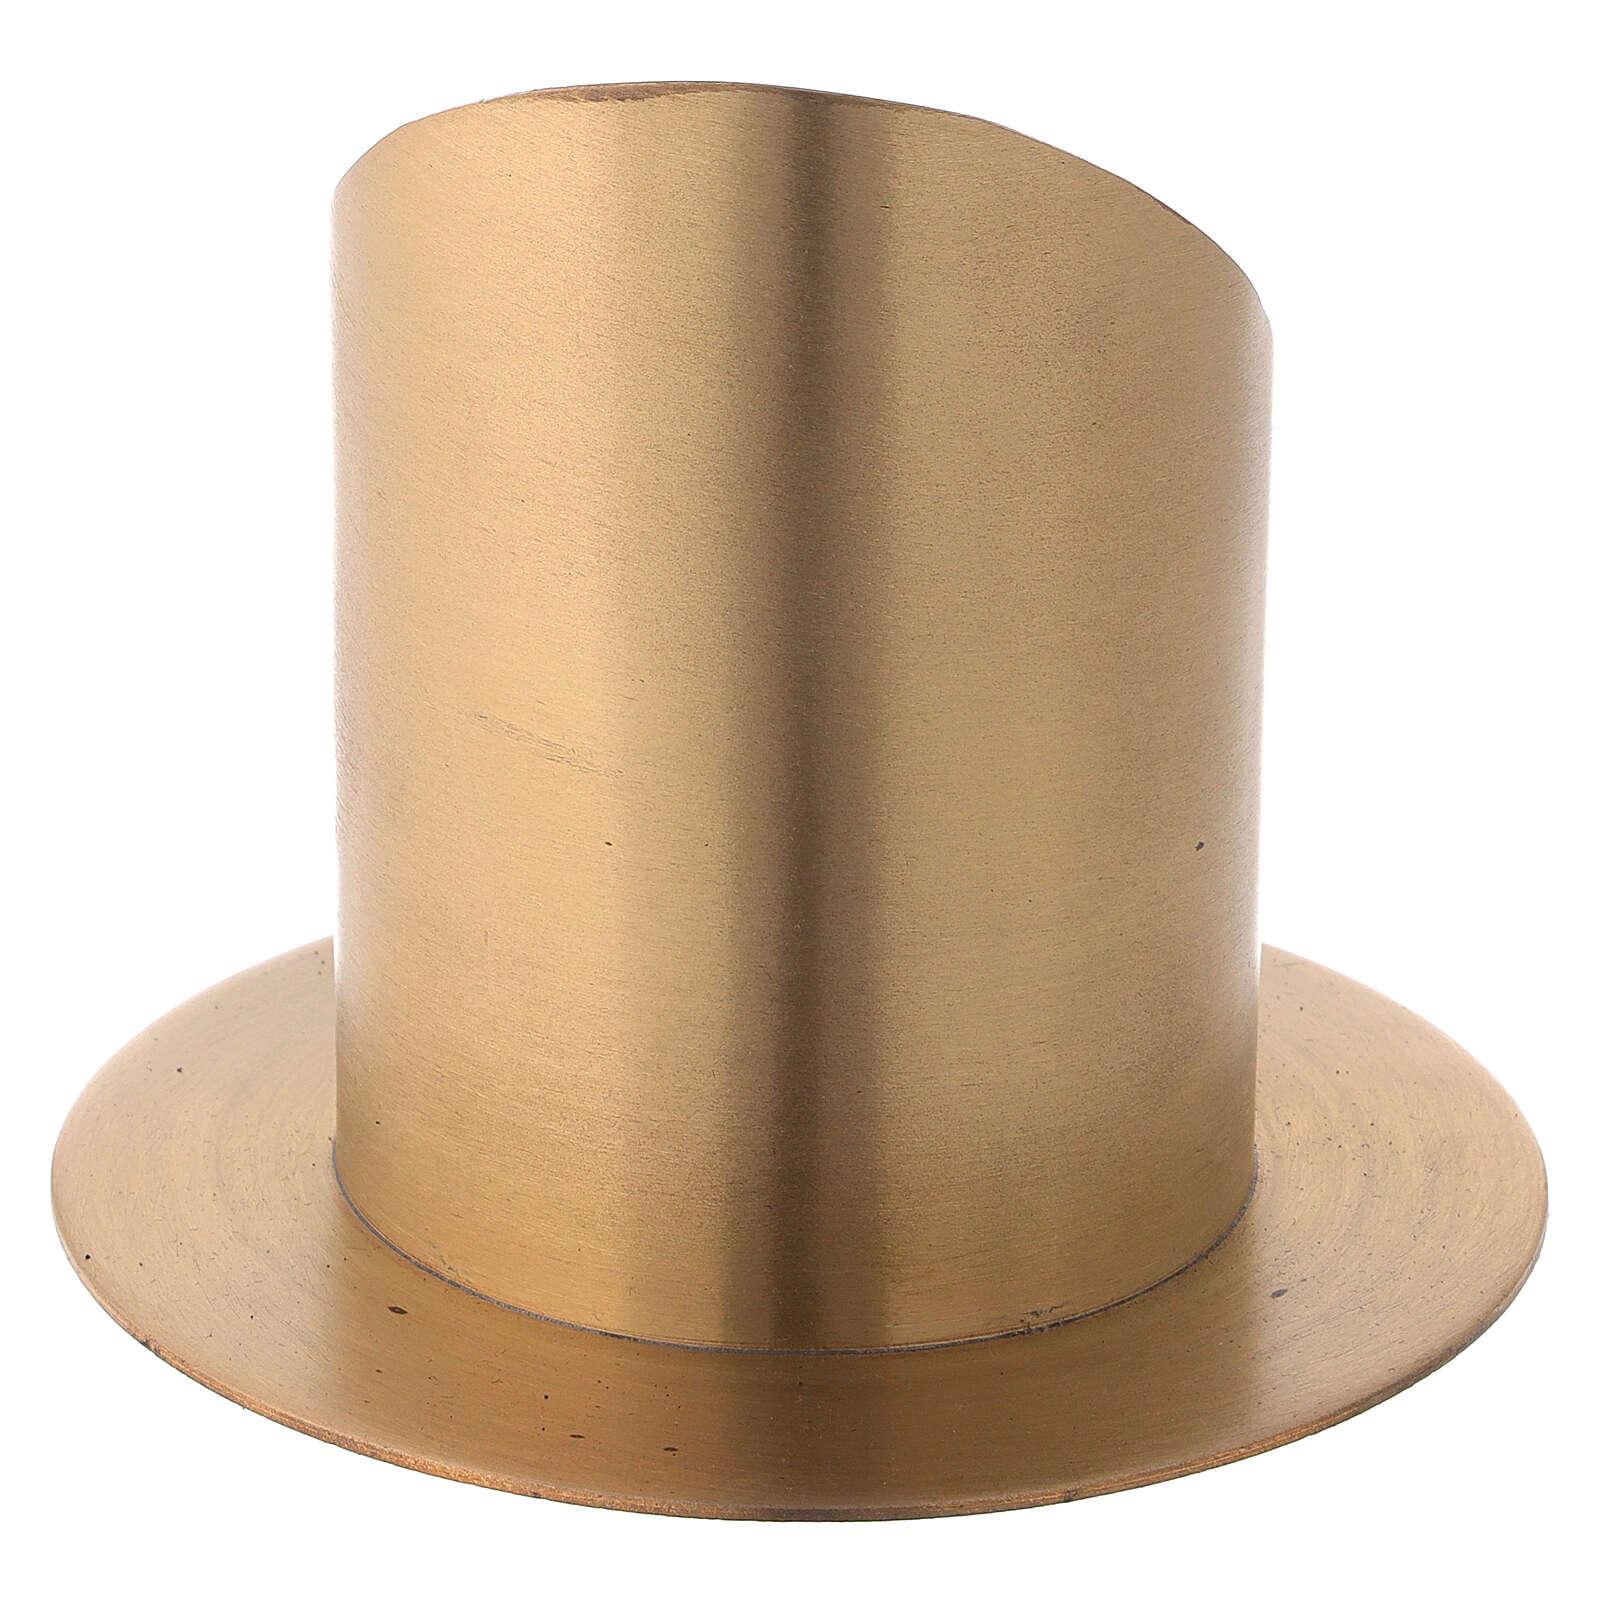 Open candlestick nickel-plated brass satin finish diameter 3 in 4